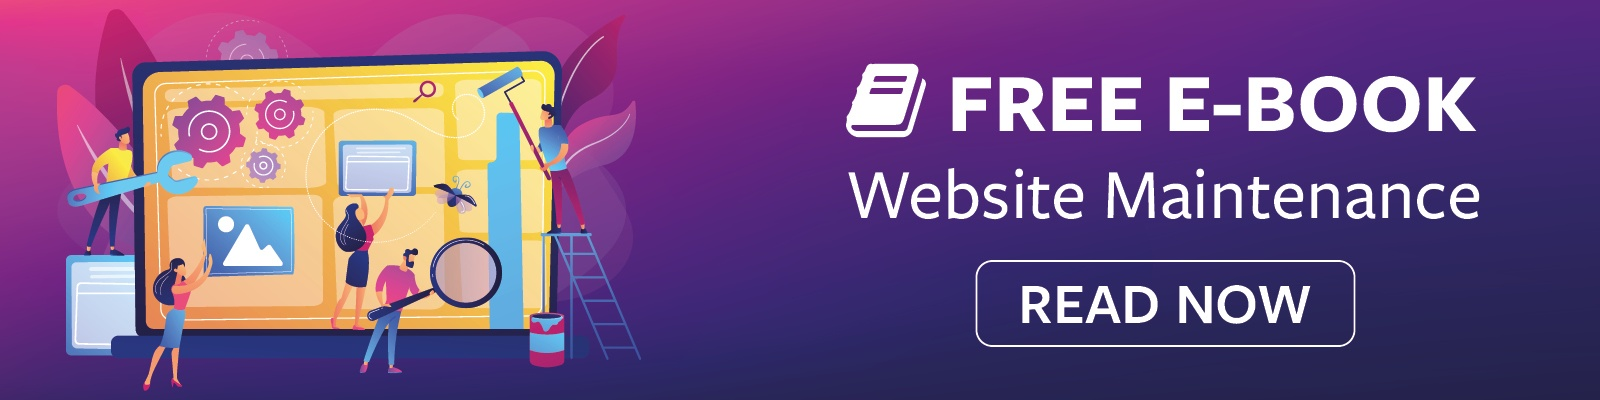 Free-Ebook-Download-WebSite-Maintenance-Back9-Creative